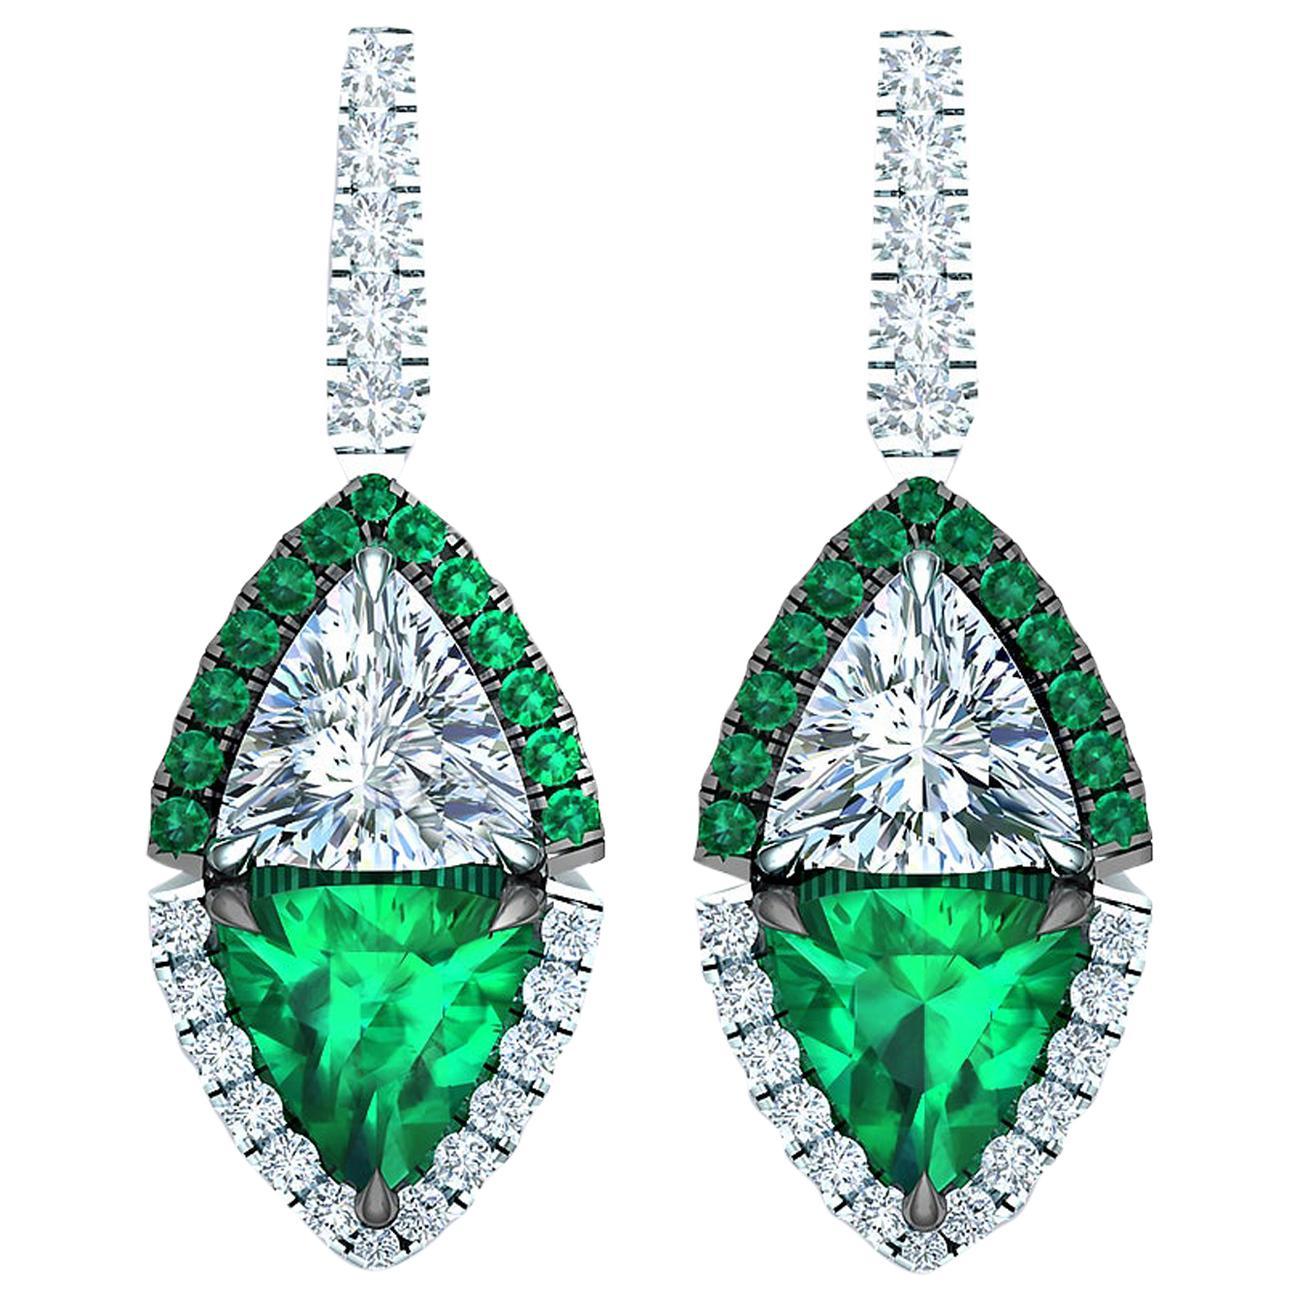 2.4 Carat Emerald and Diamond Drop Earrings